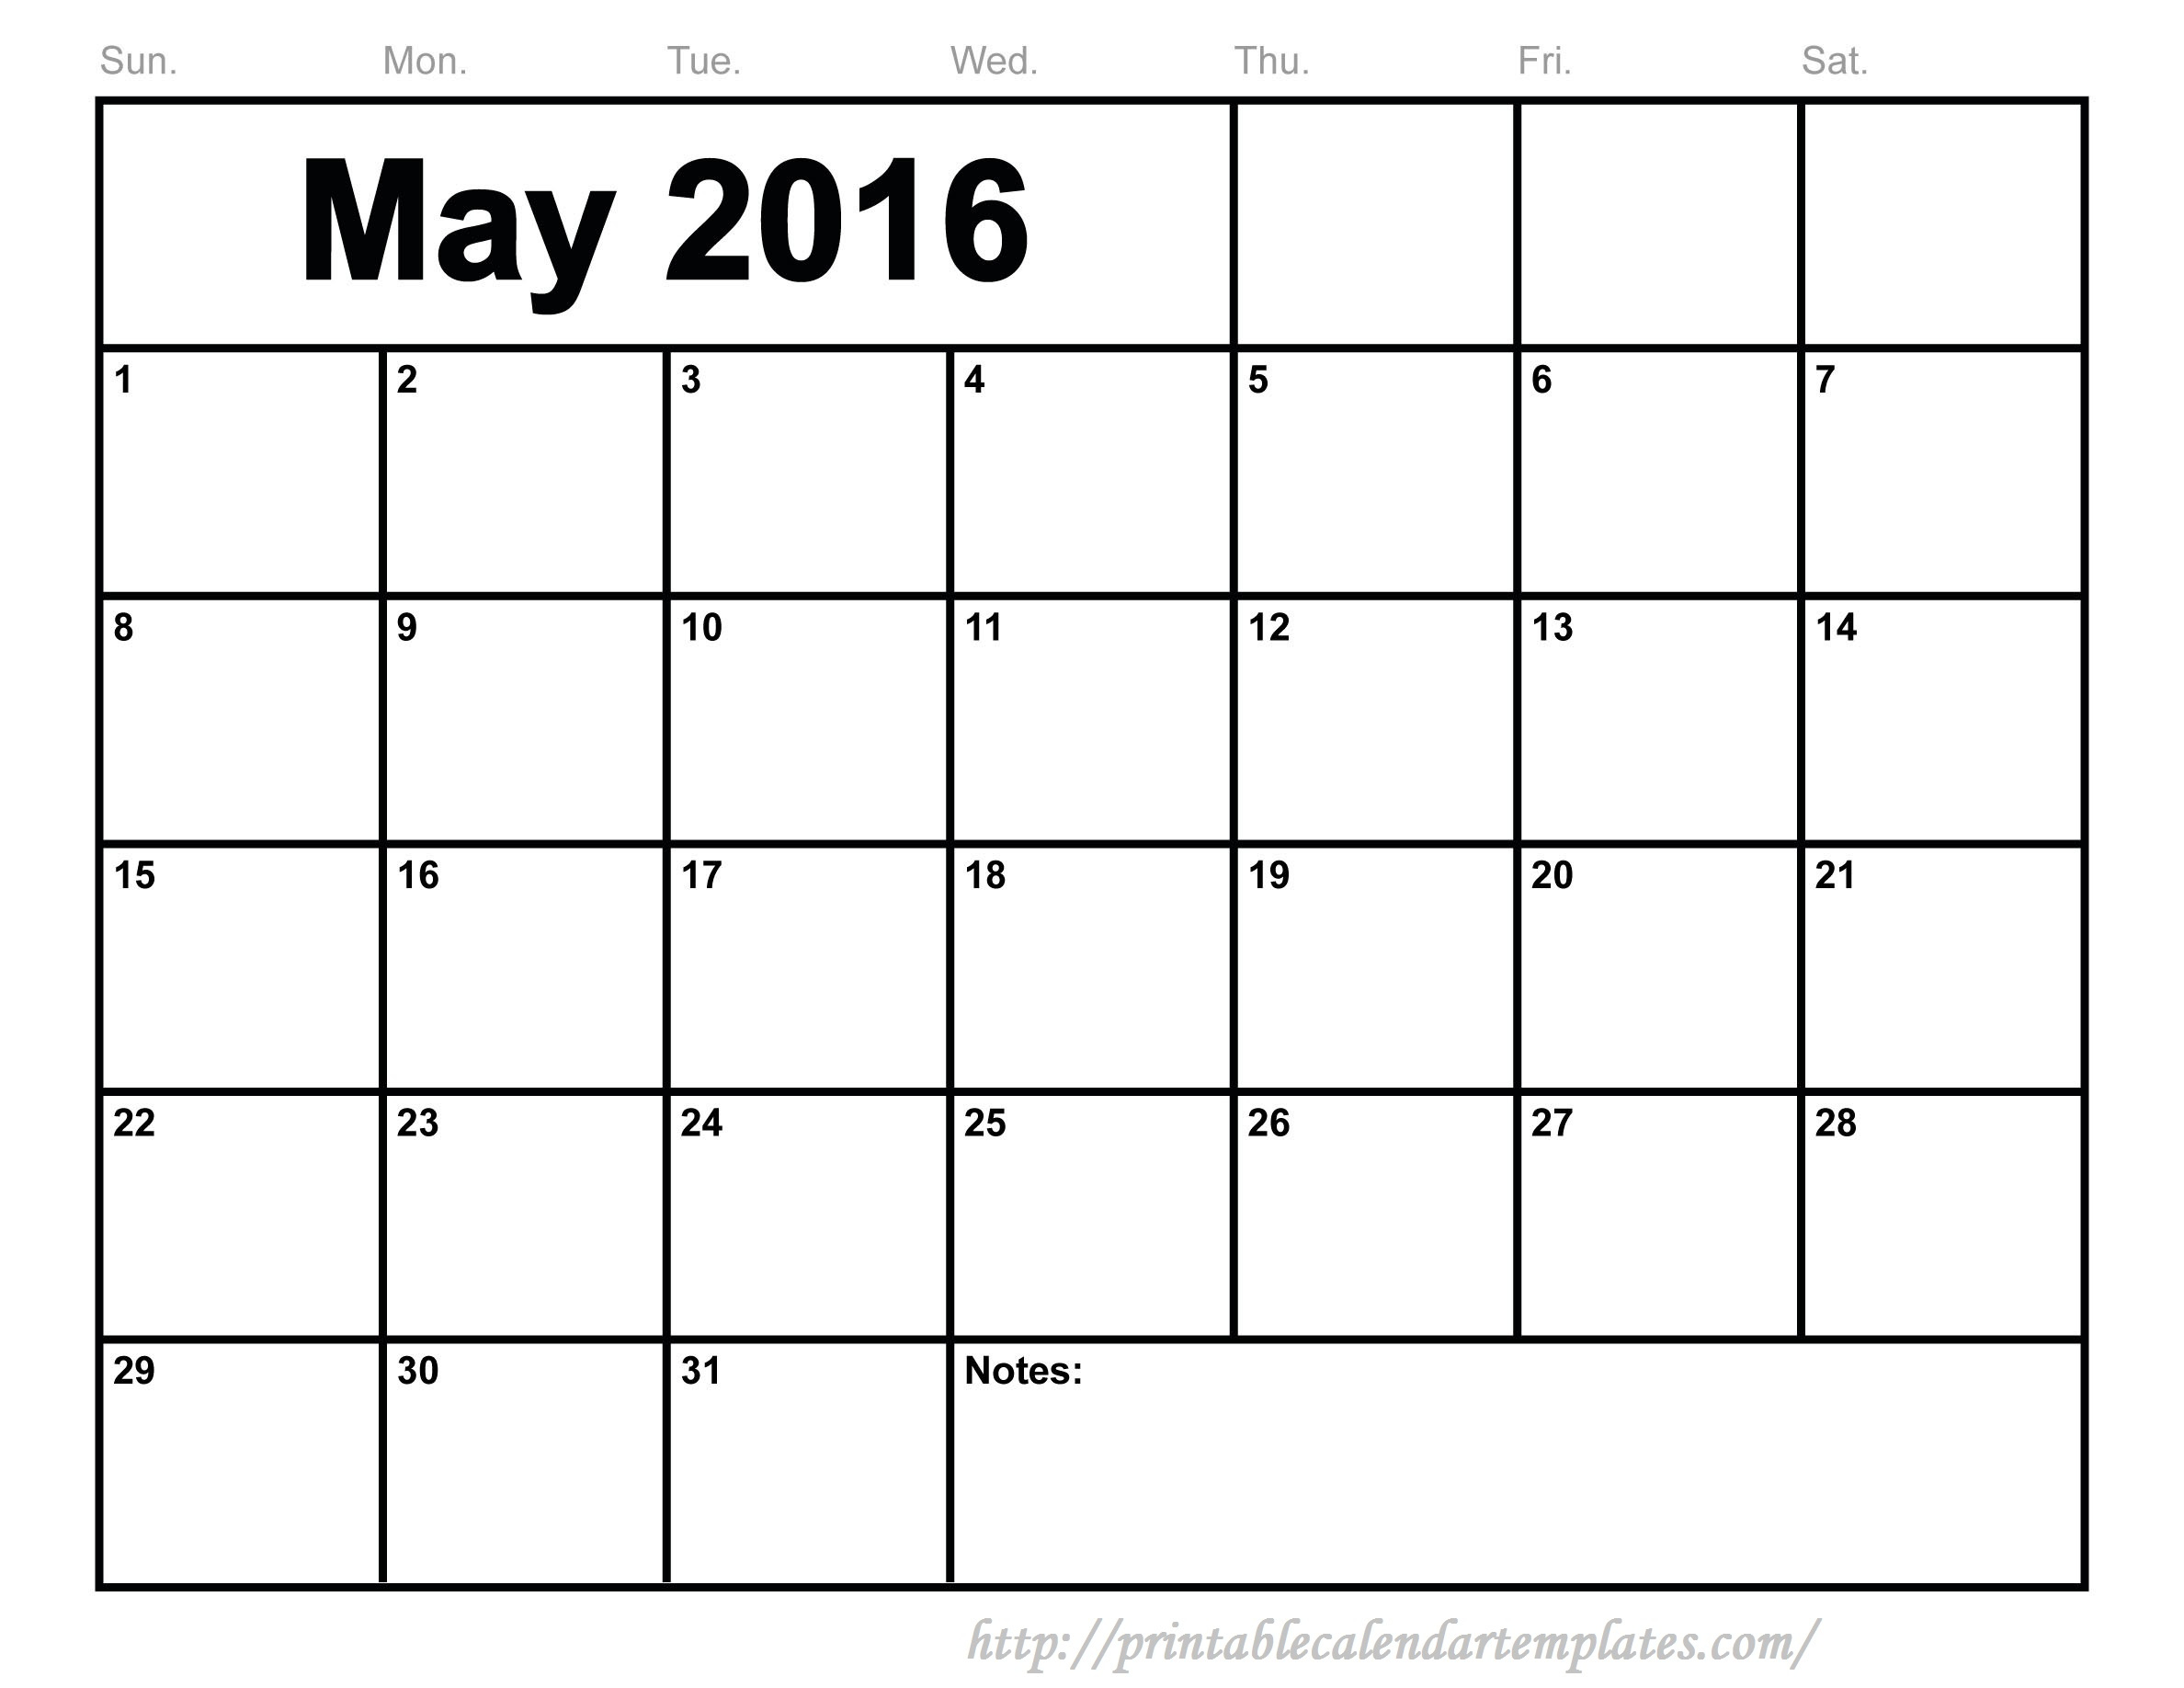 May 2016 Editable Templates   Printable Calendar Templates